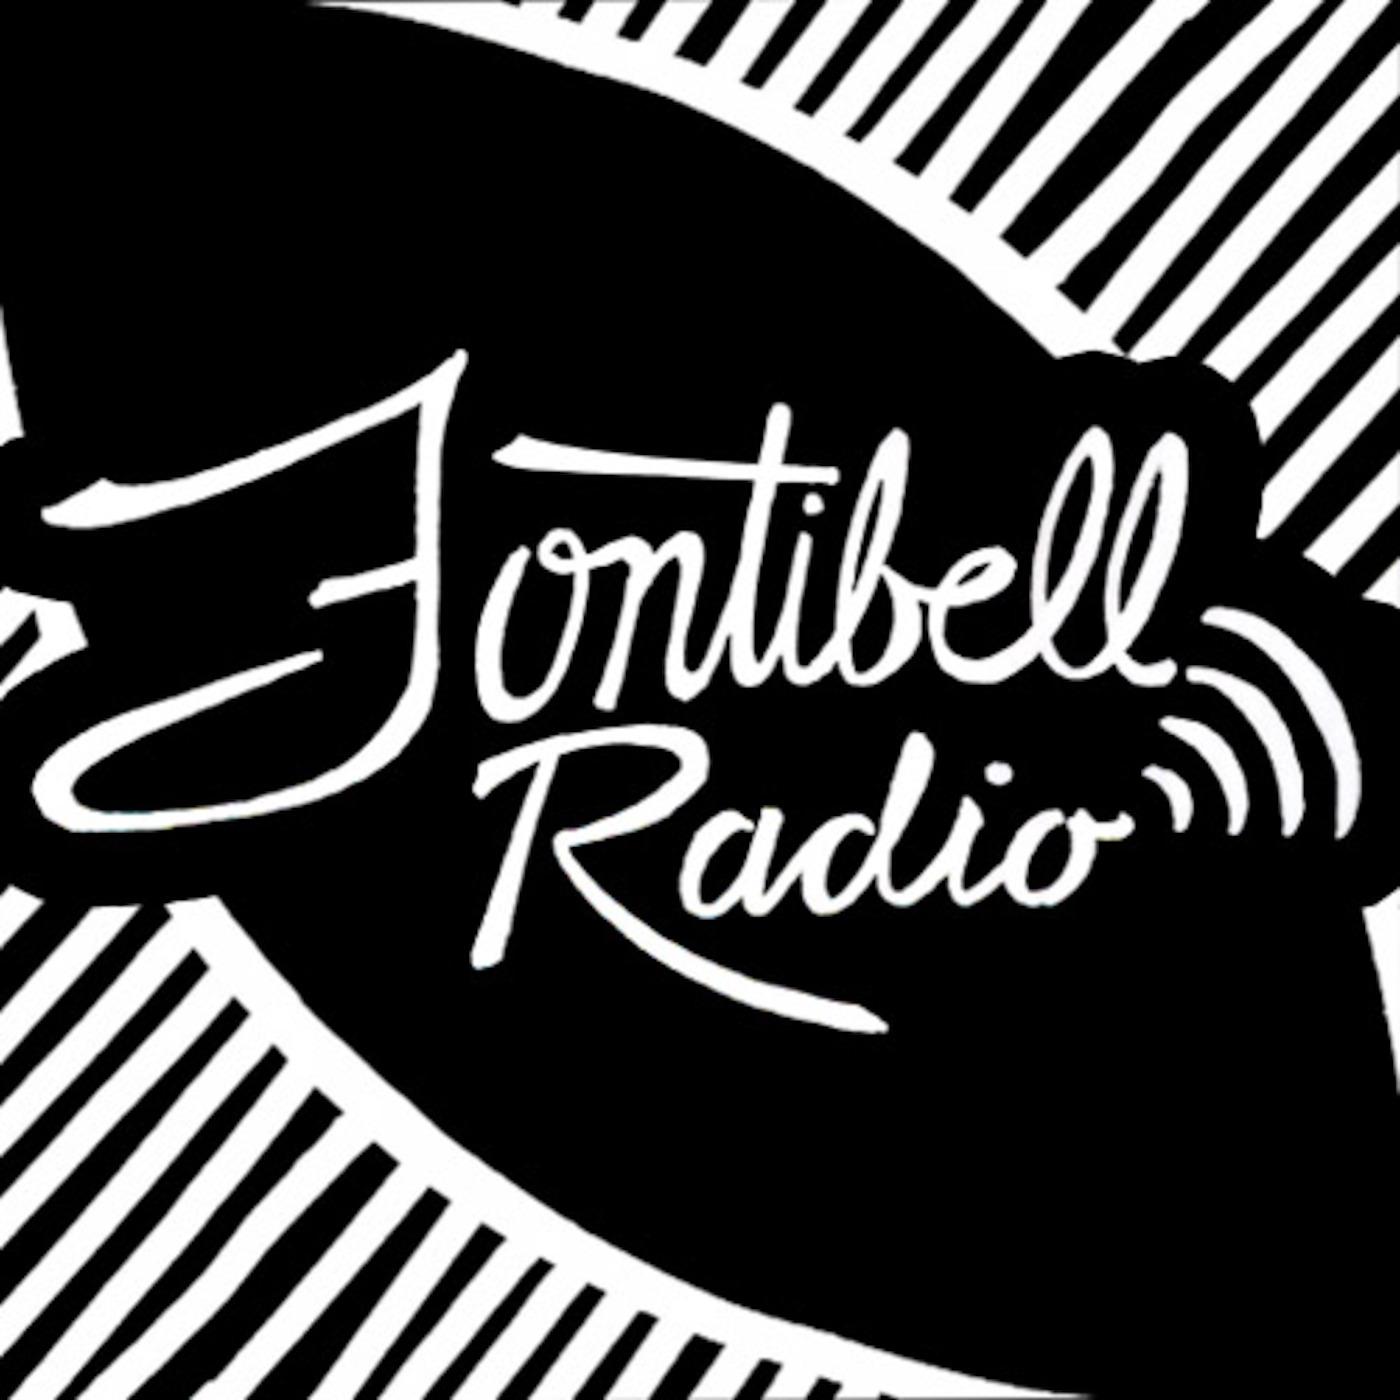 Fontibell Radio